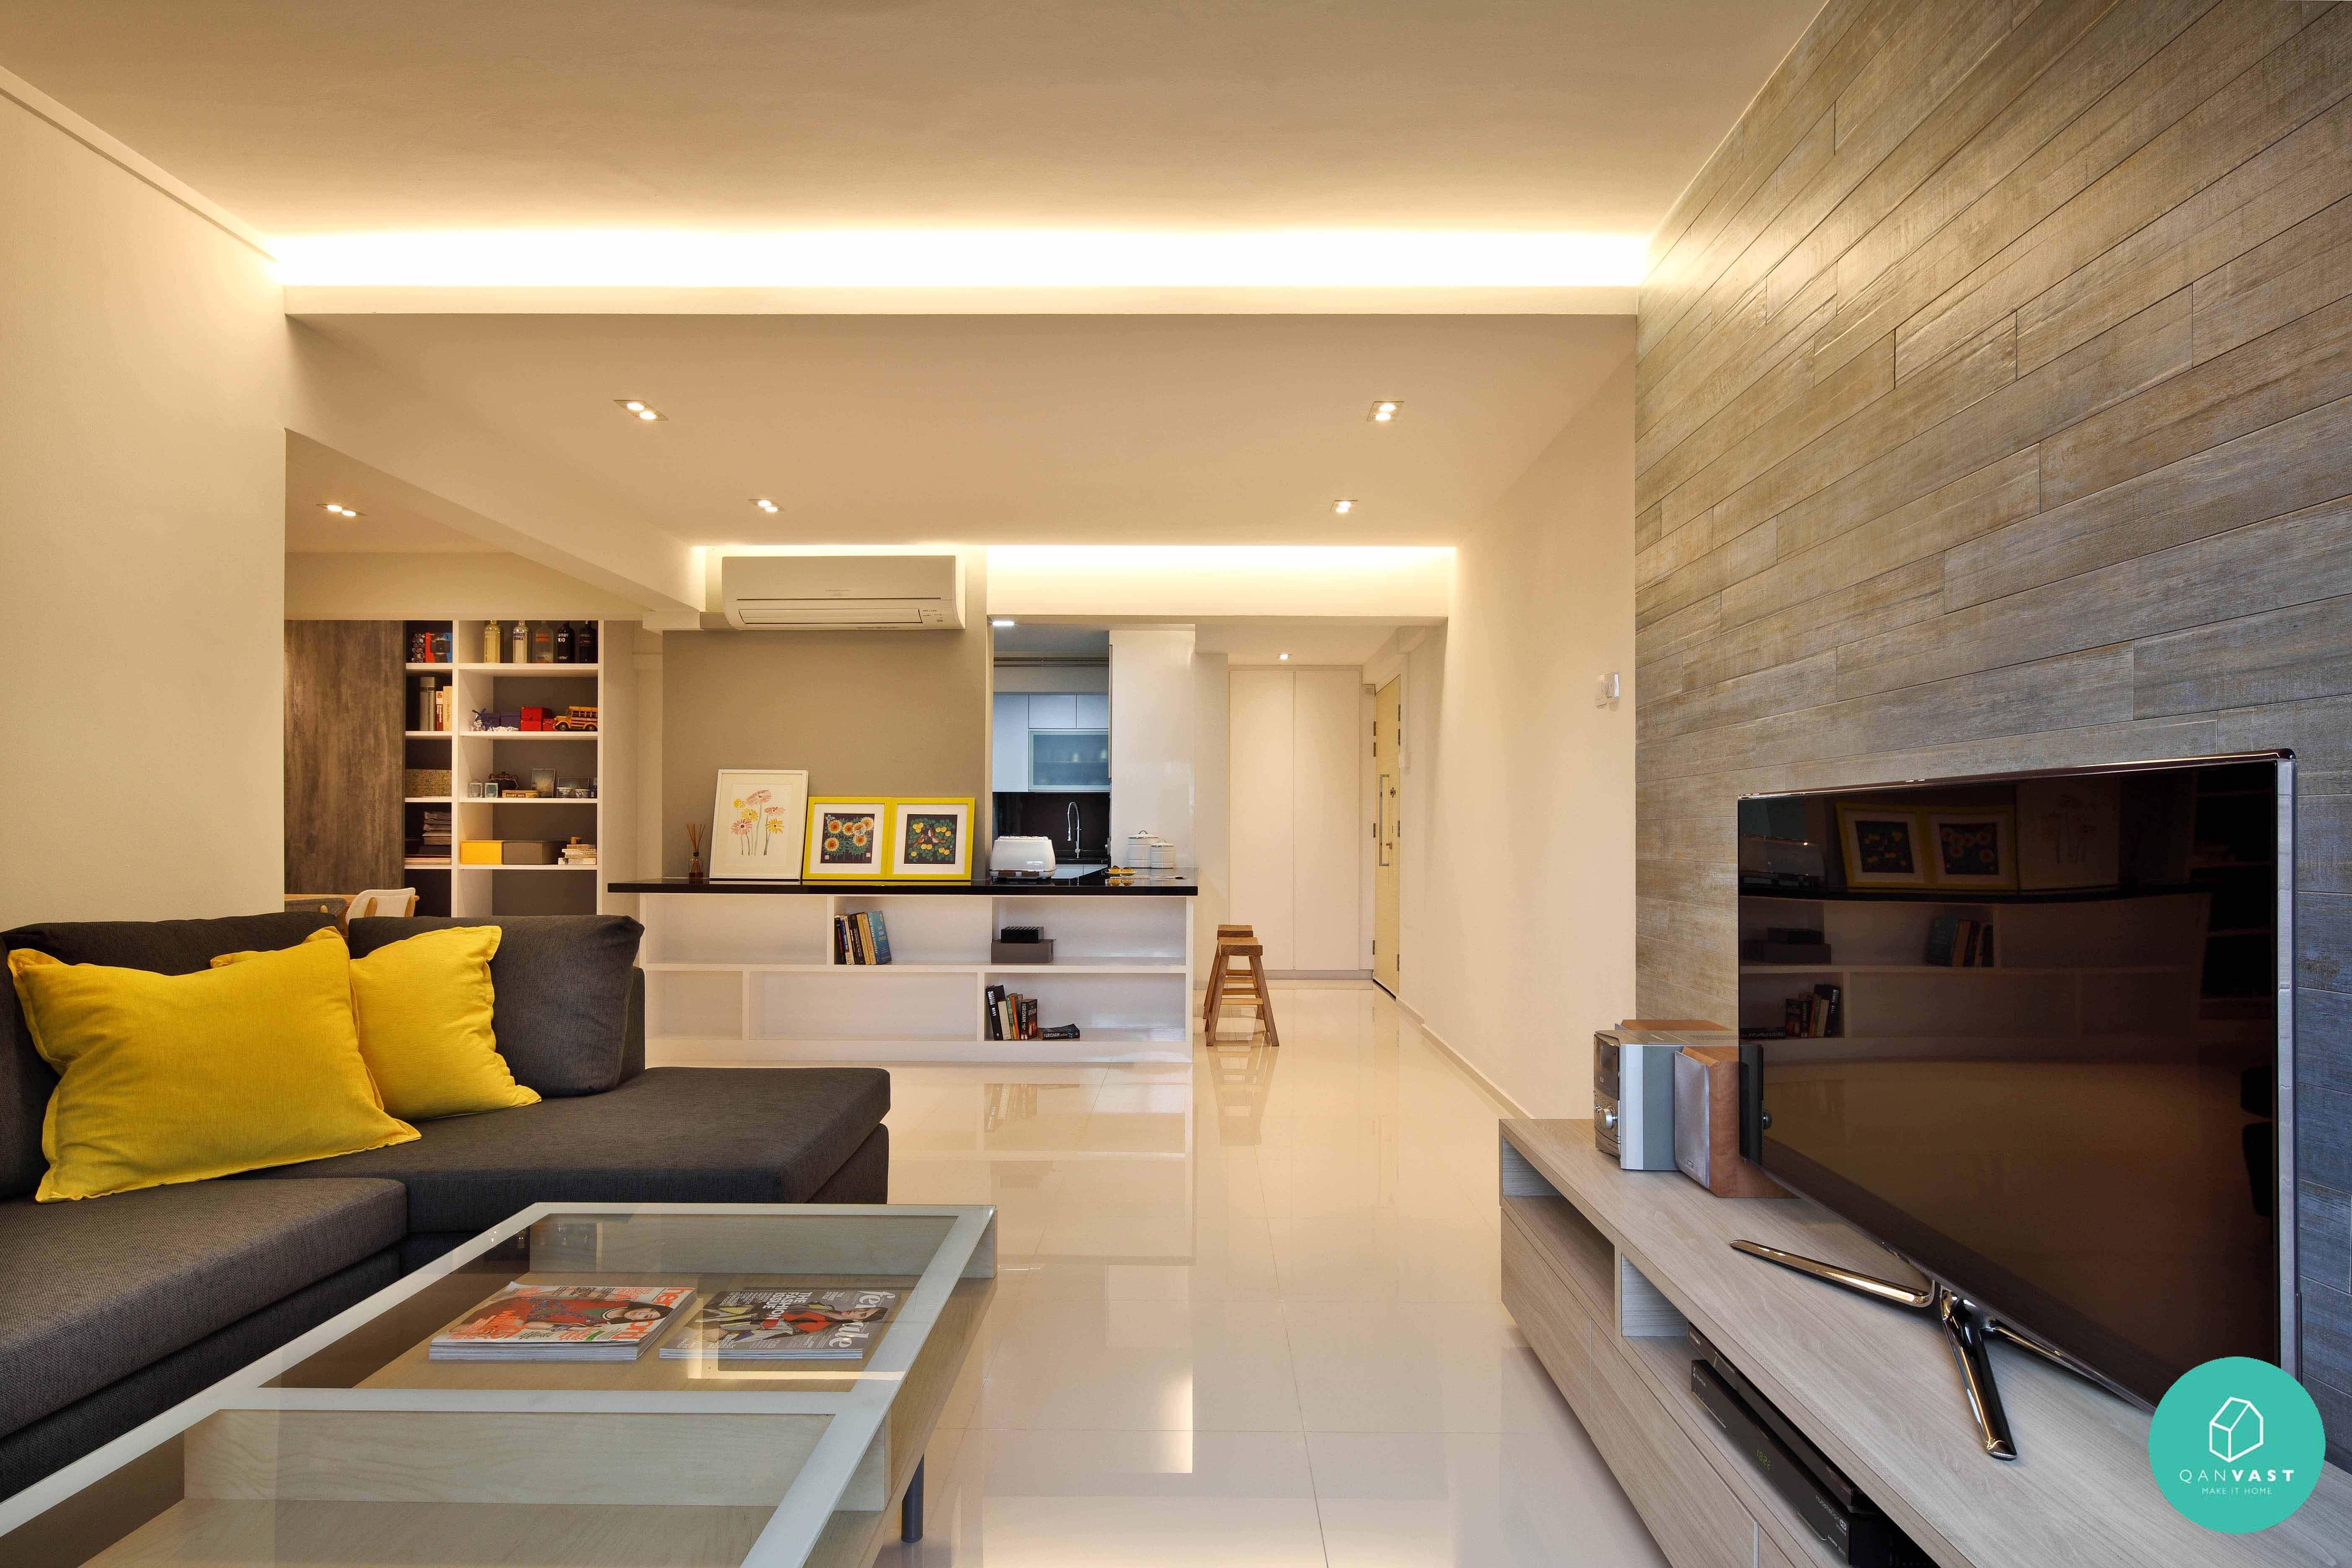 10 Beautiful Home Renovations Under 50000